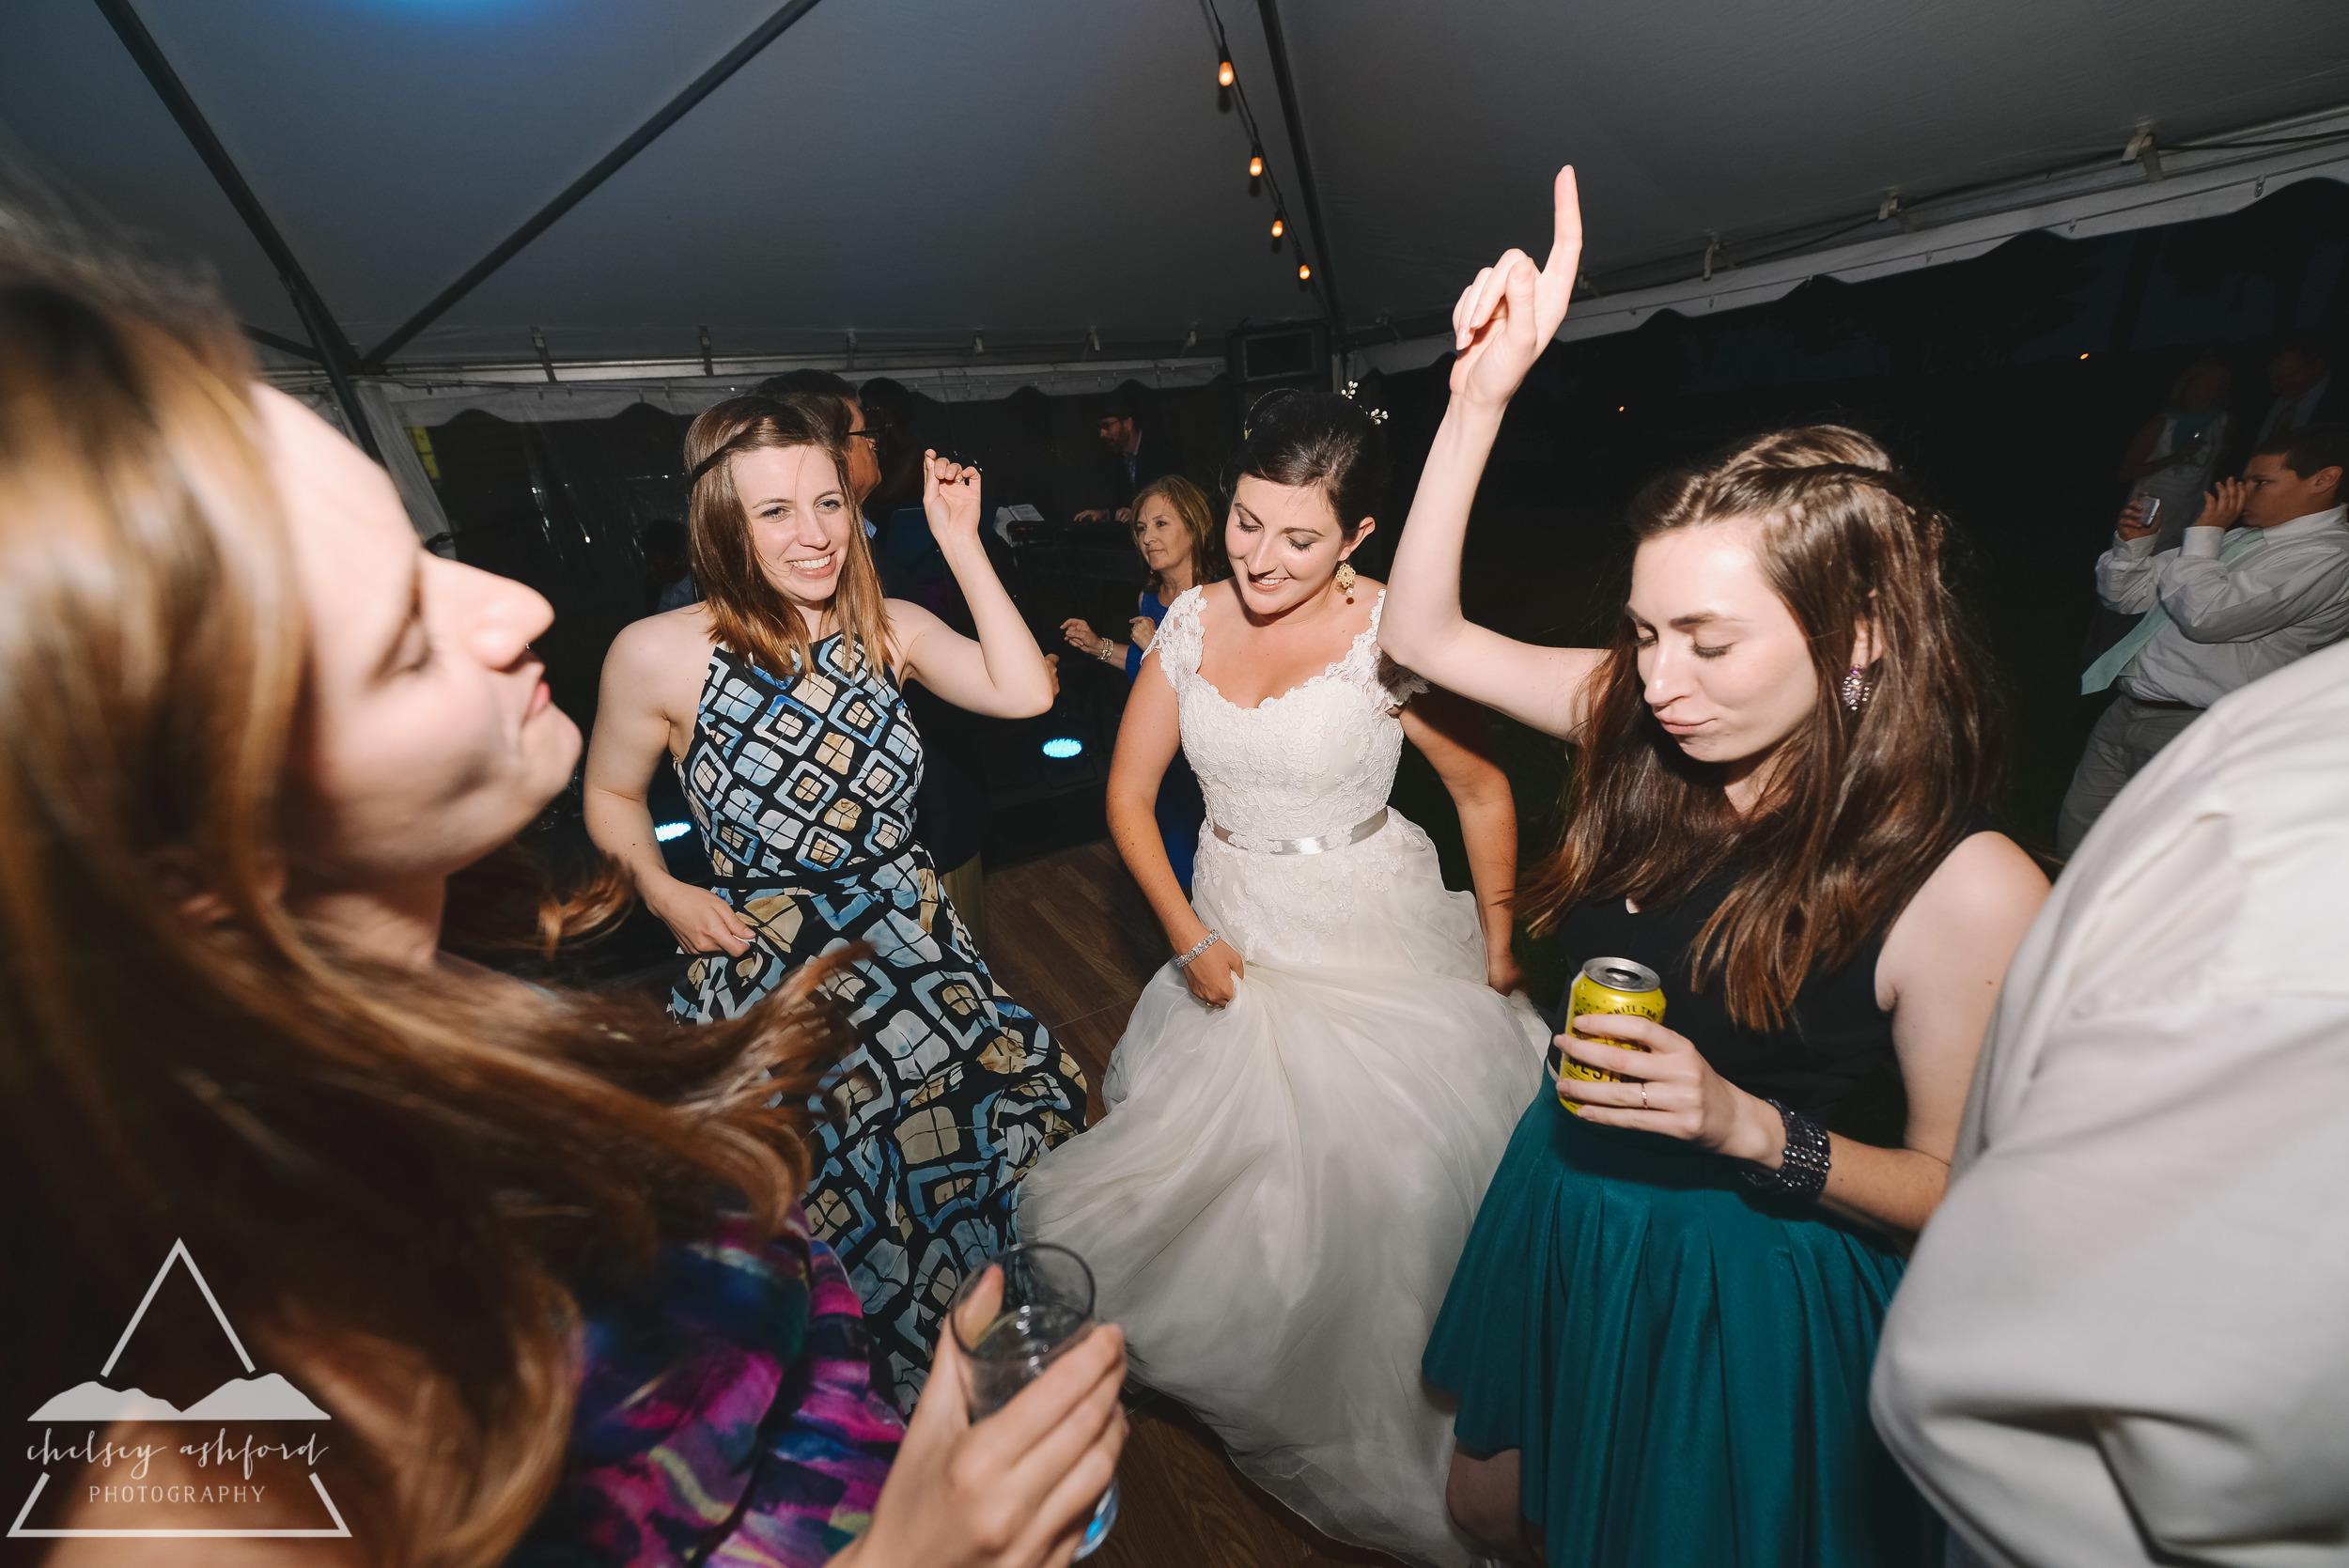 Clarkson_wedding_web-172.jpg